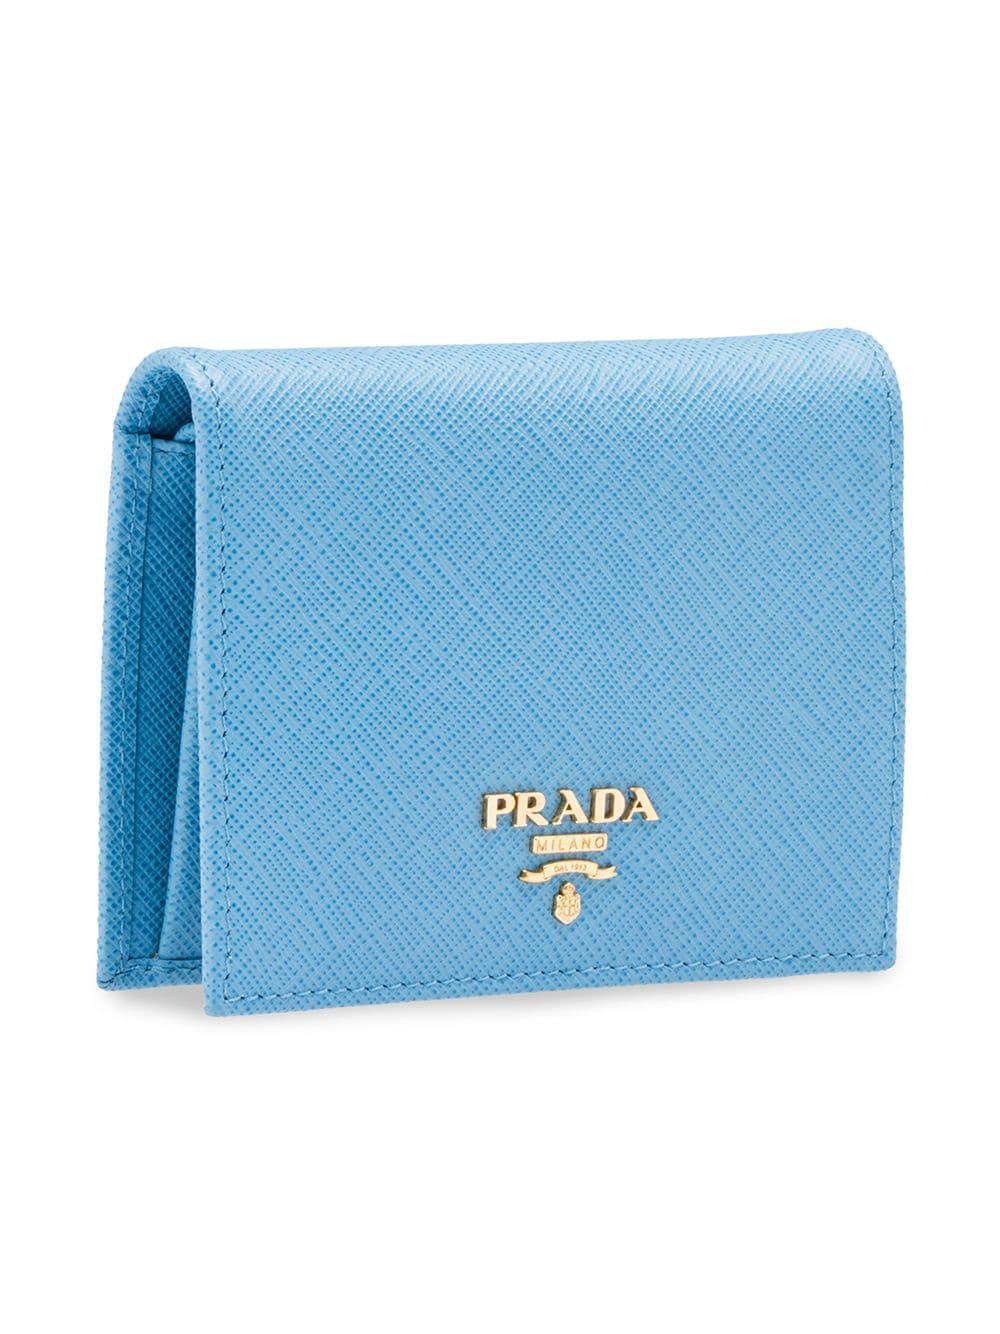 38eec1e502ca Lyst - Prada Logo Plaque Small Wallet in Blue